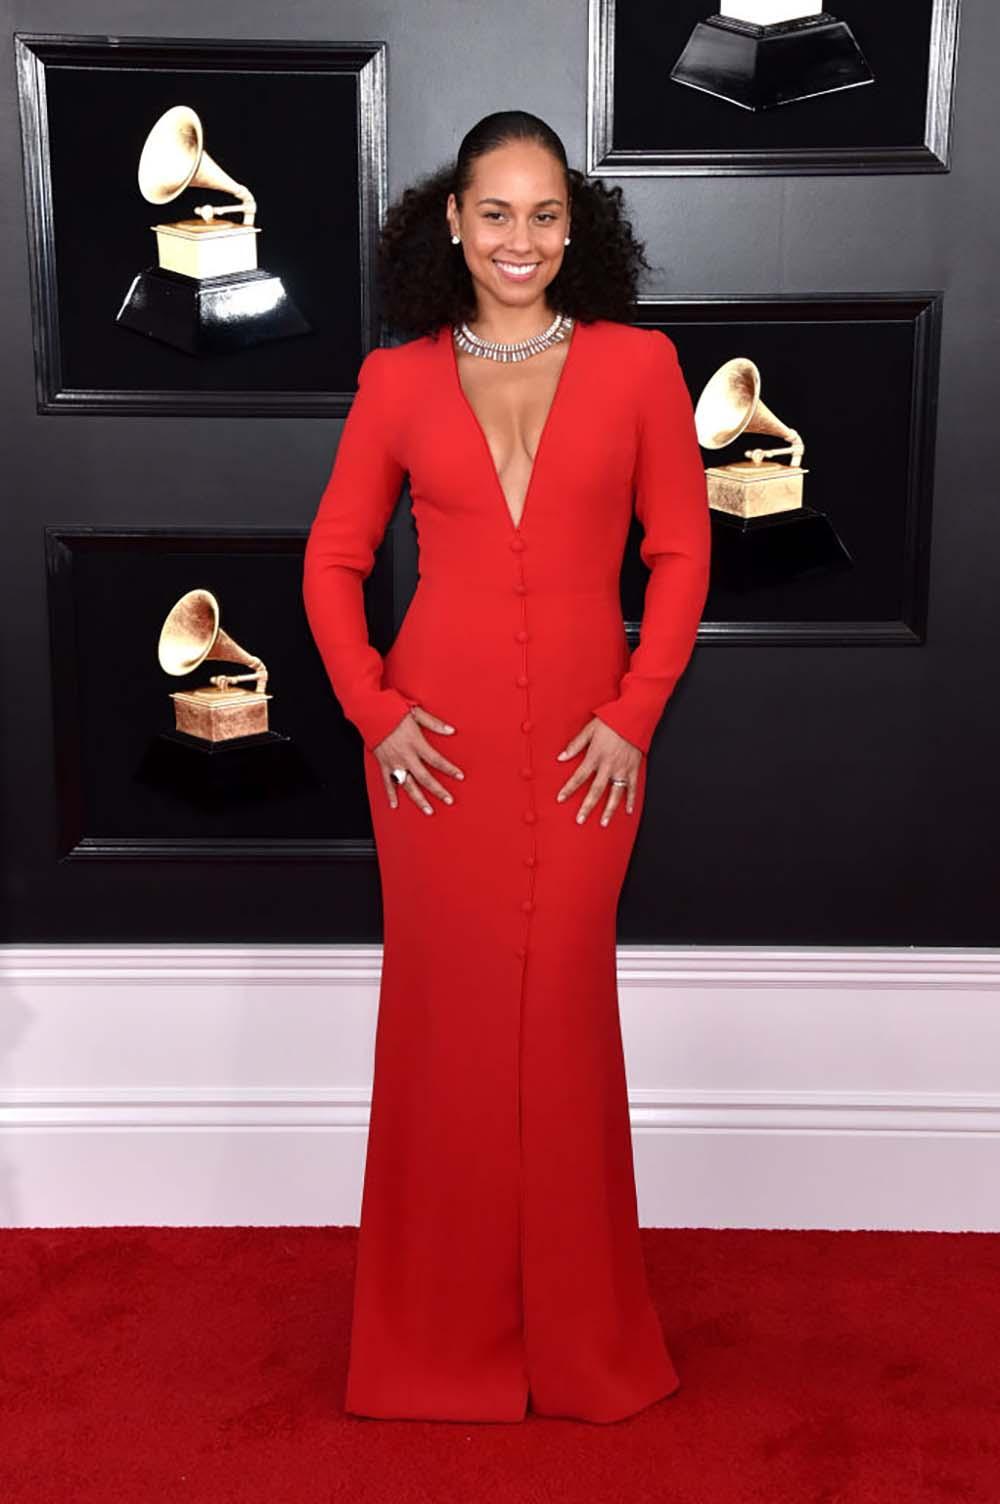 7 hottest Grammy bodies-Alicia-Keys-Grammy-Awards.